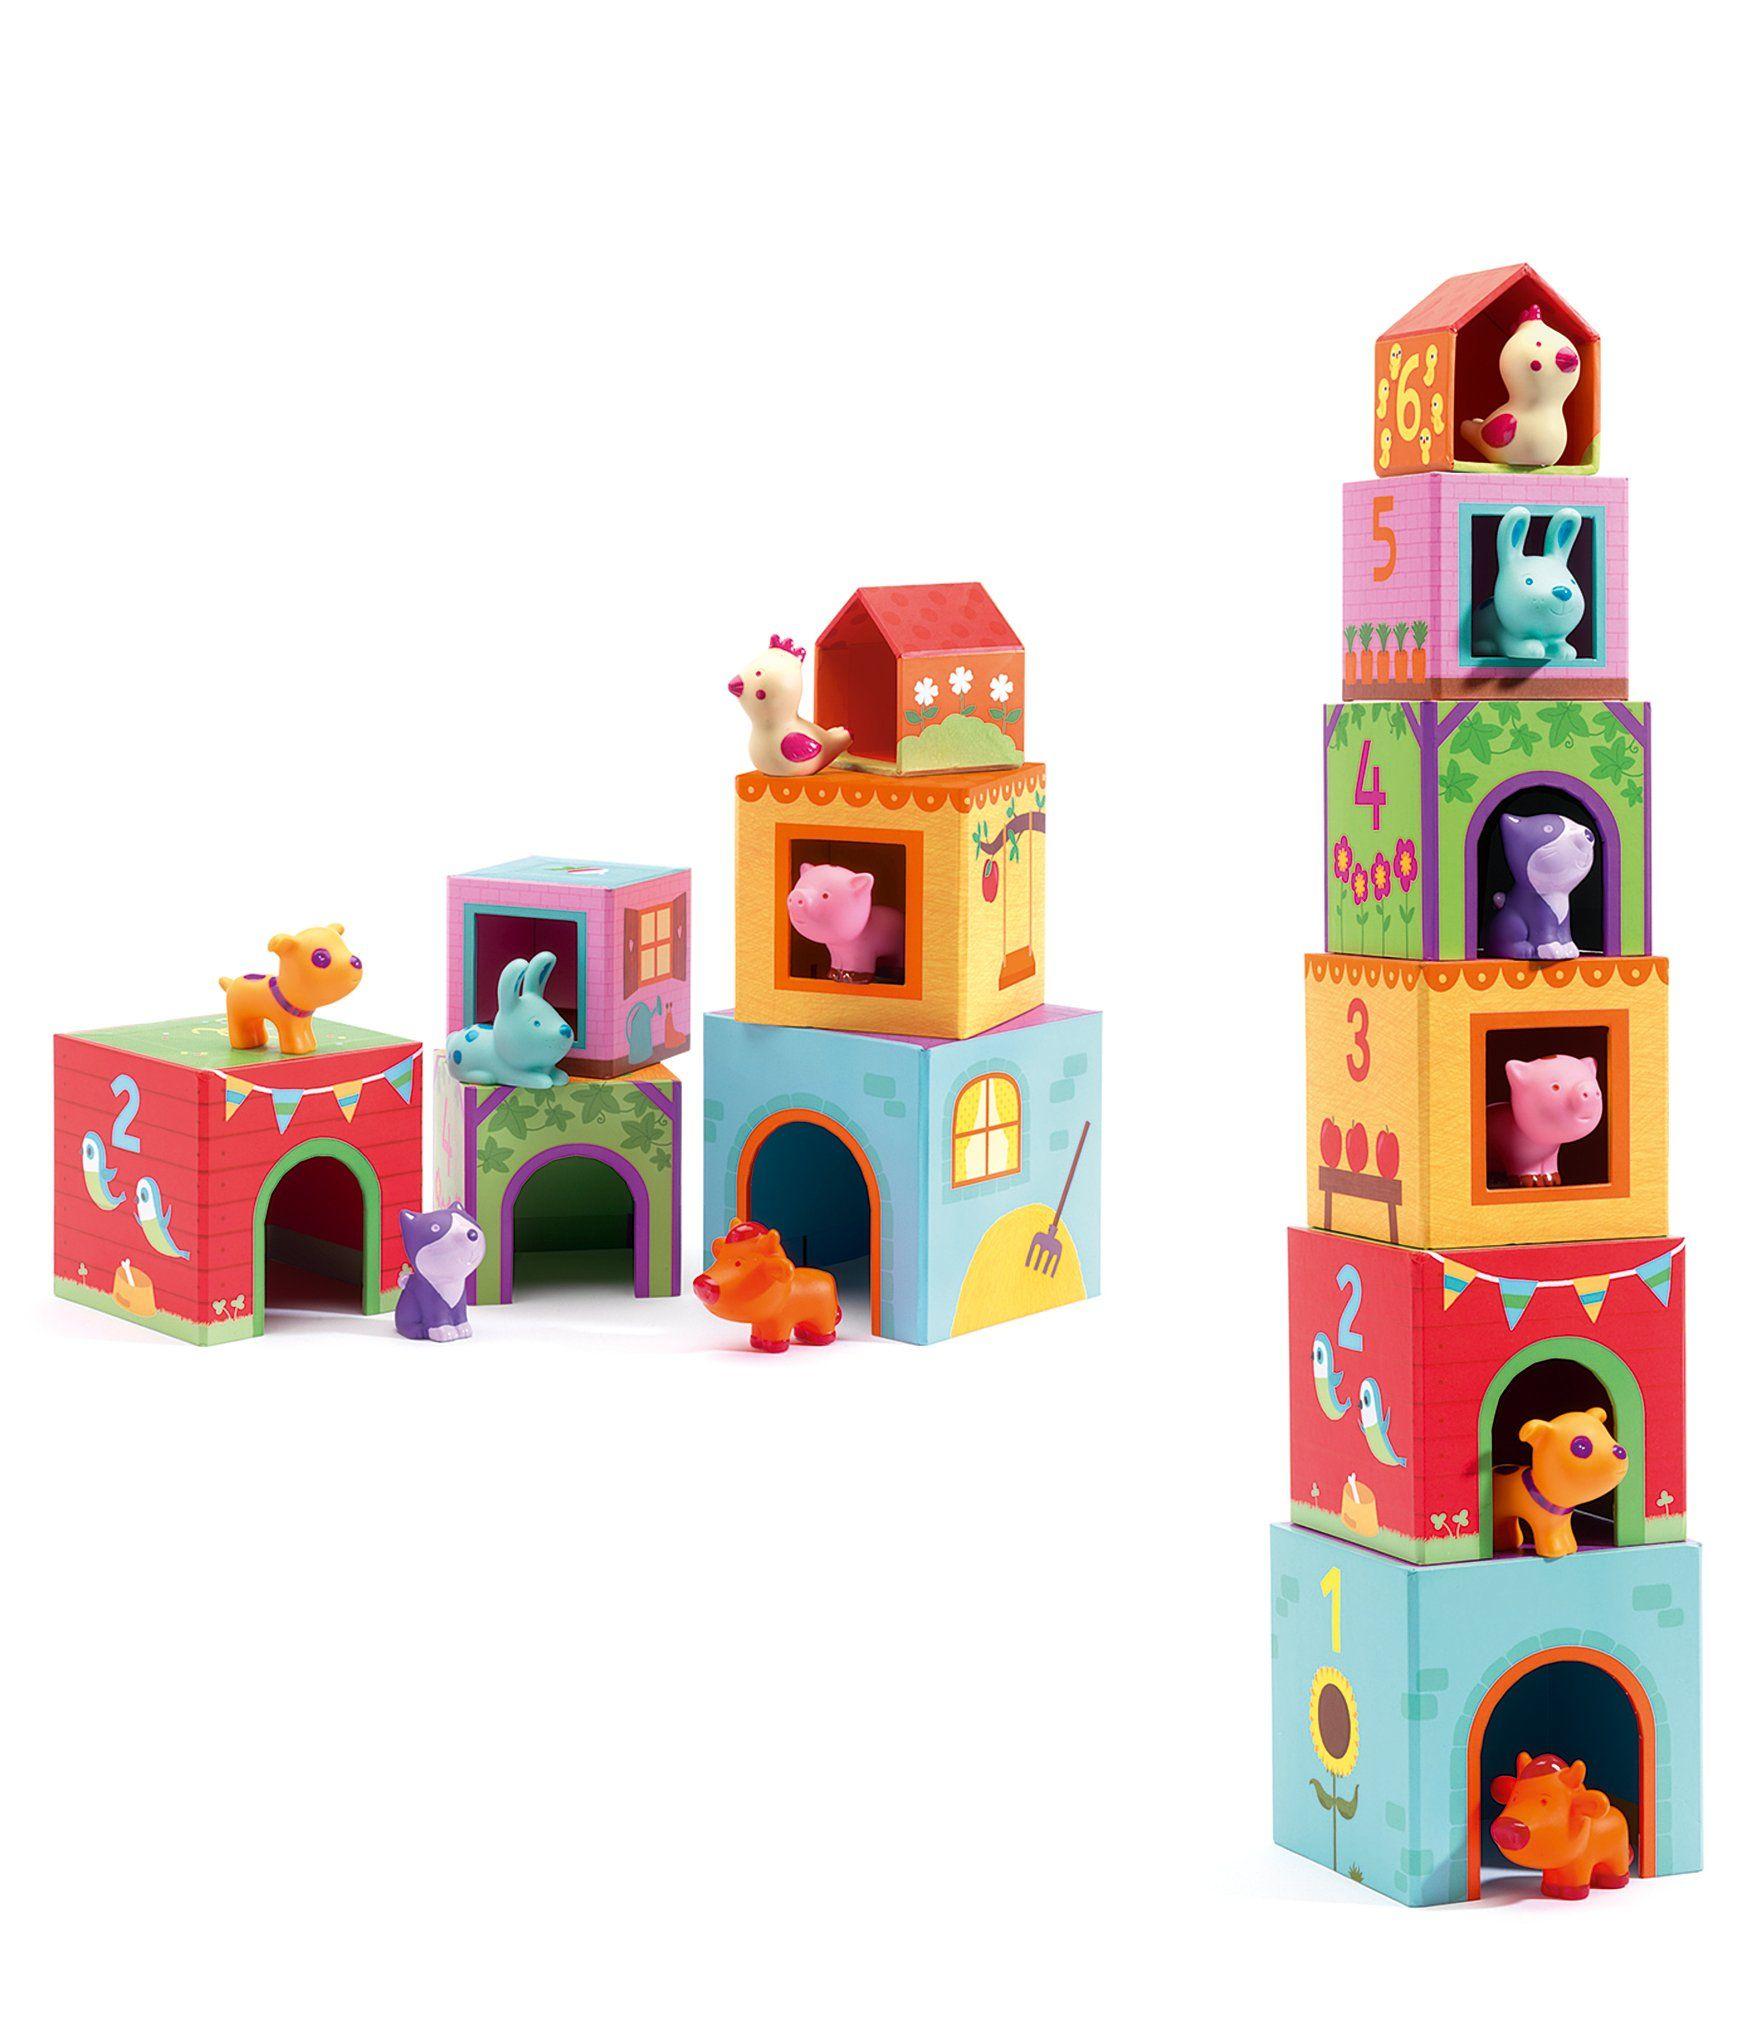 Djeco topanifarm stacking blocks dillards in 2020 toy